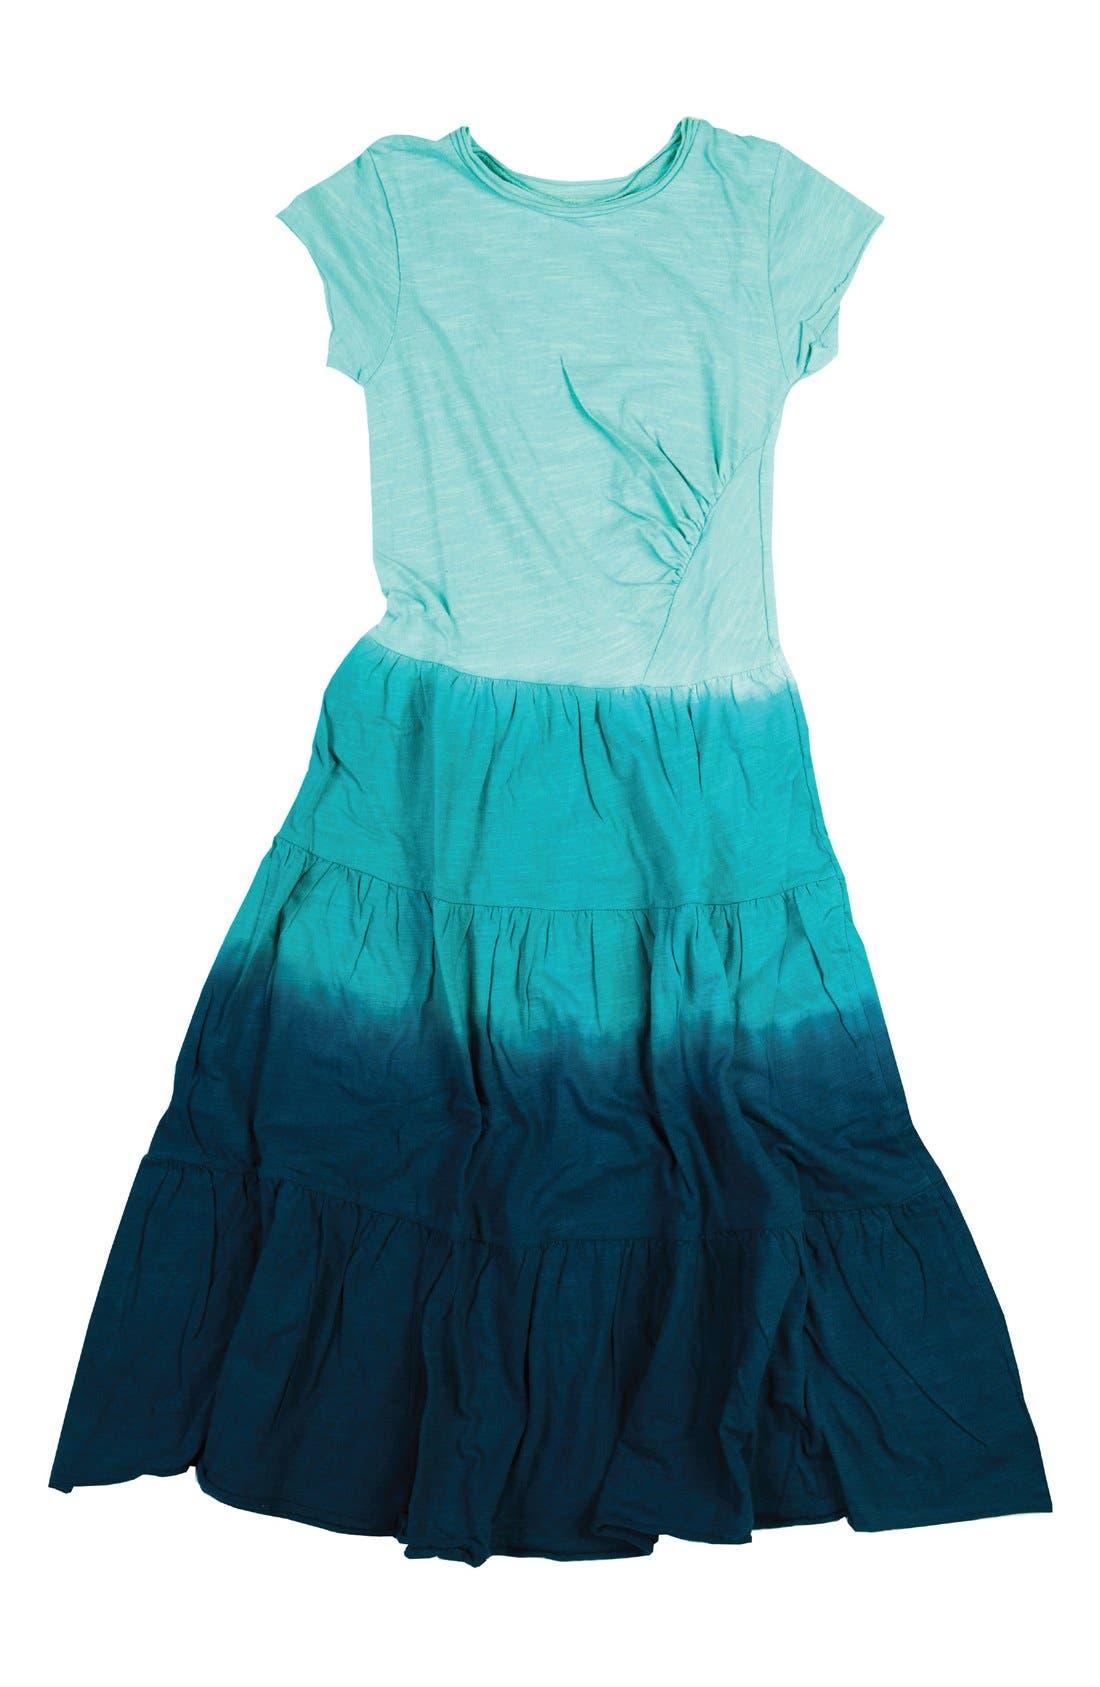 Blue three rose corsage jersey dress